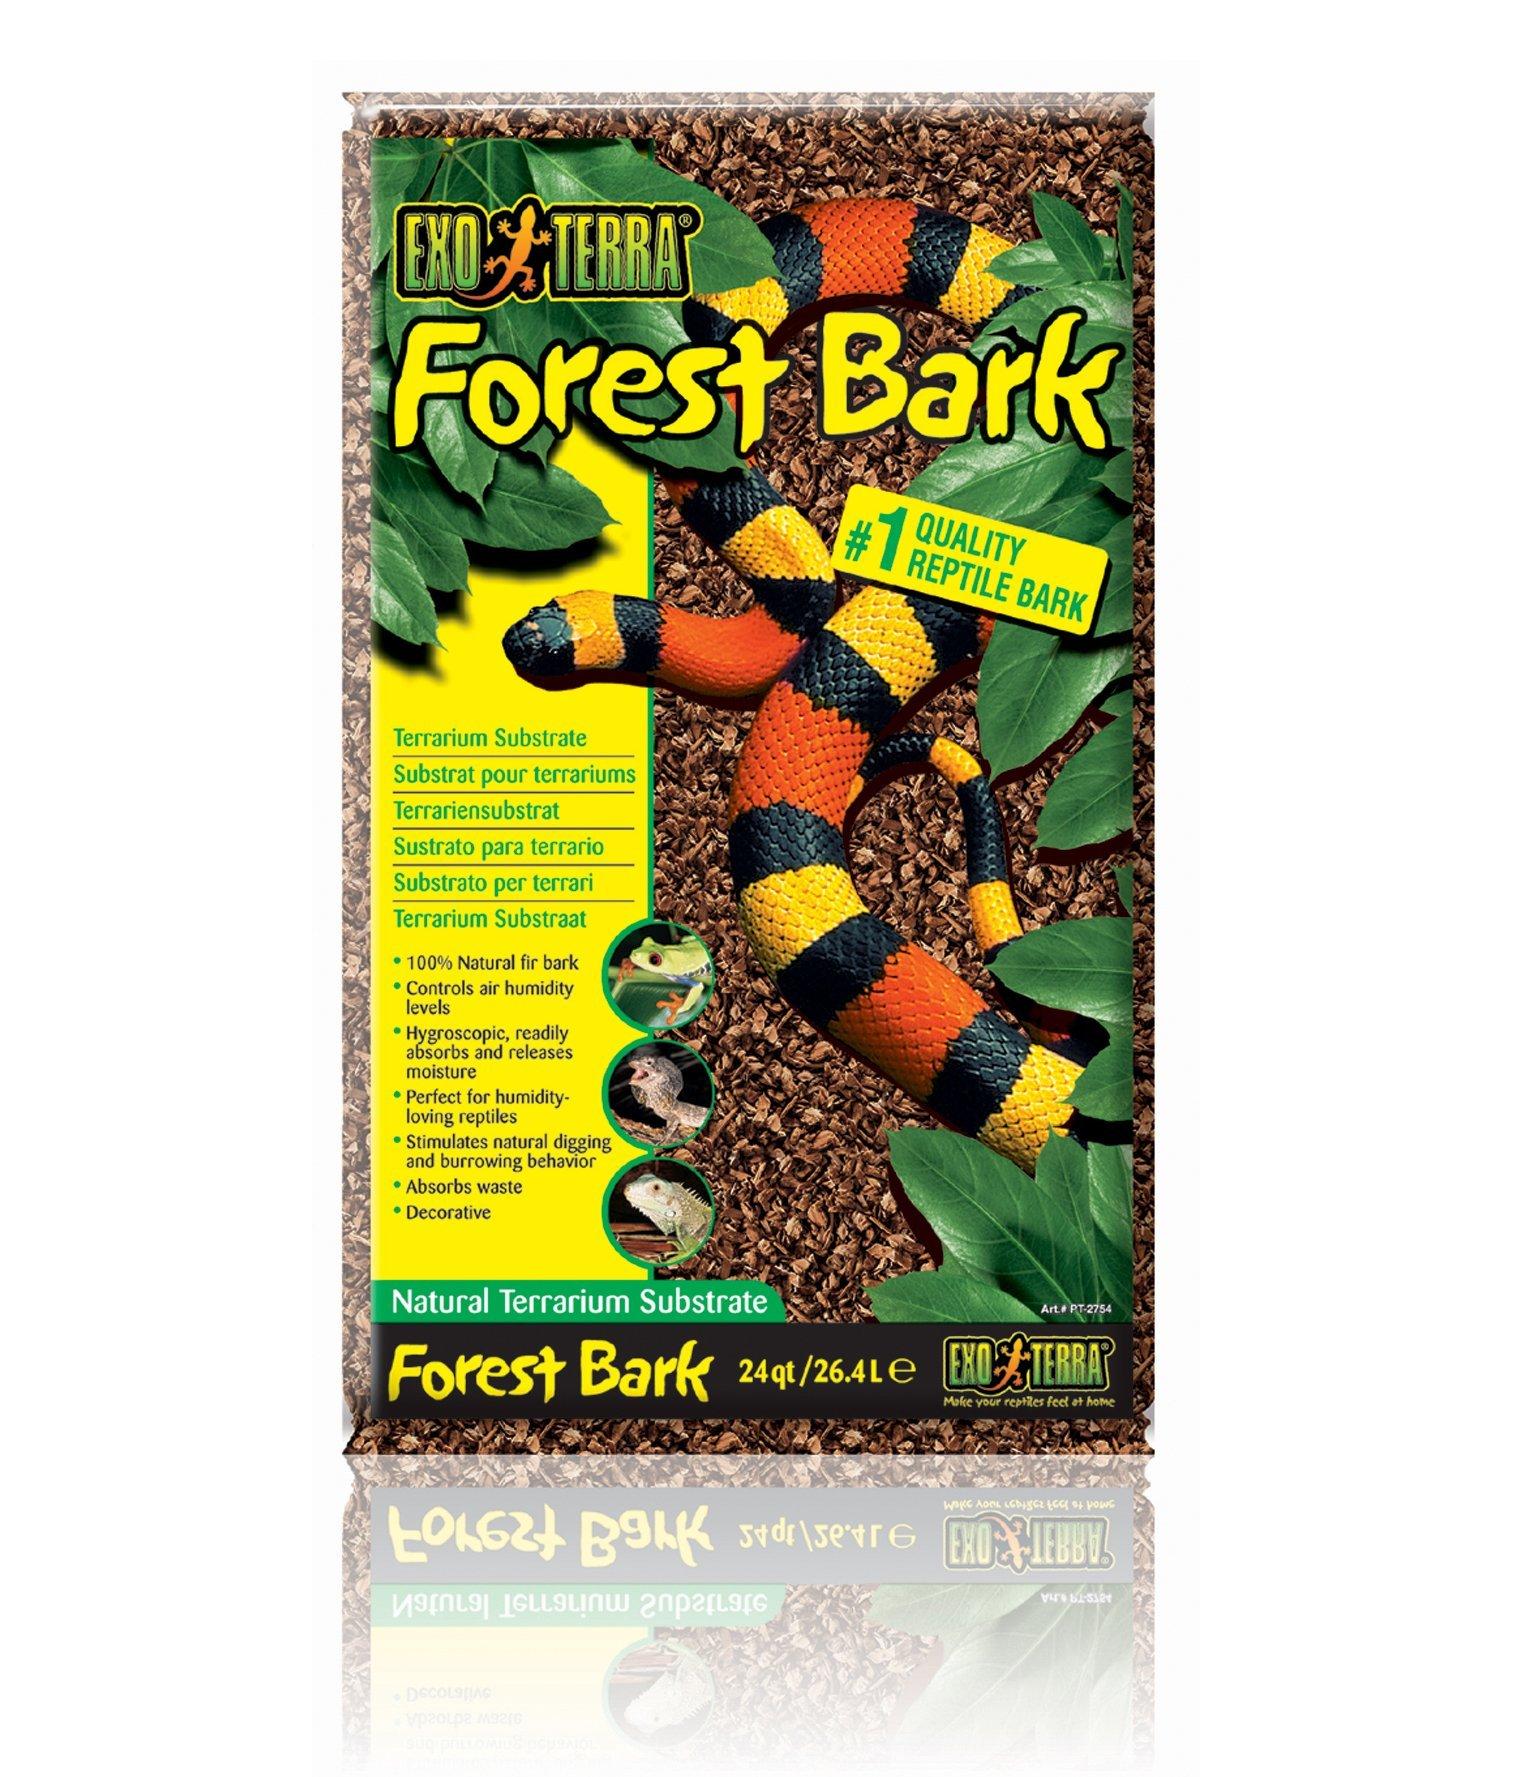 Exo Terra Exo Terra Forest Bark Terrarium Substrate, 26.4 L (24 Qt) 1